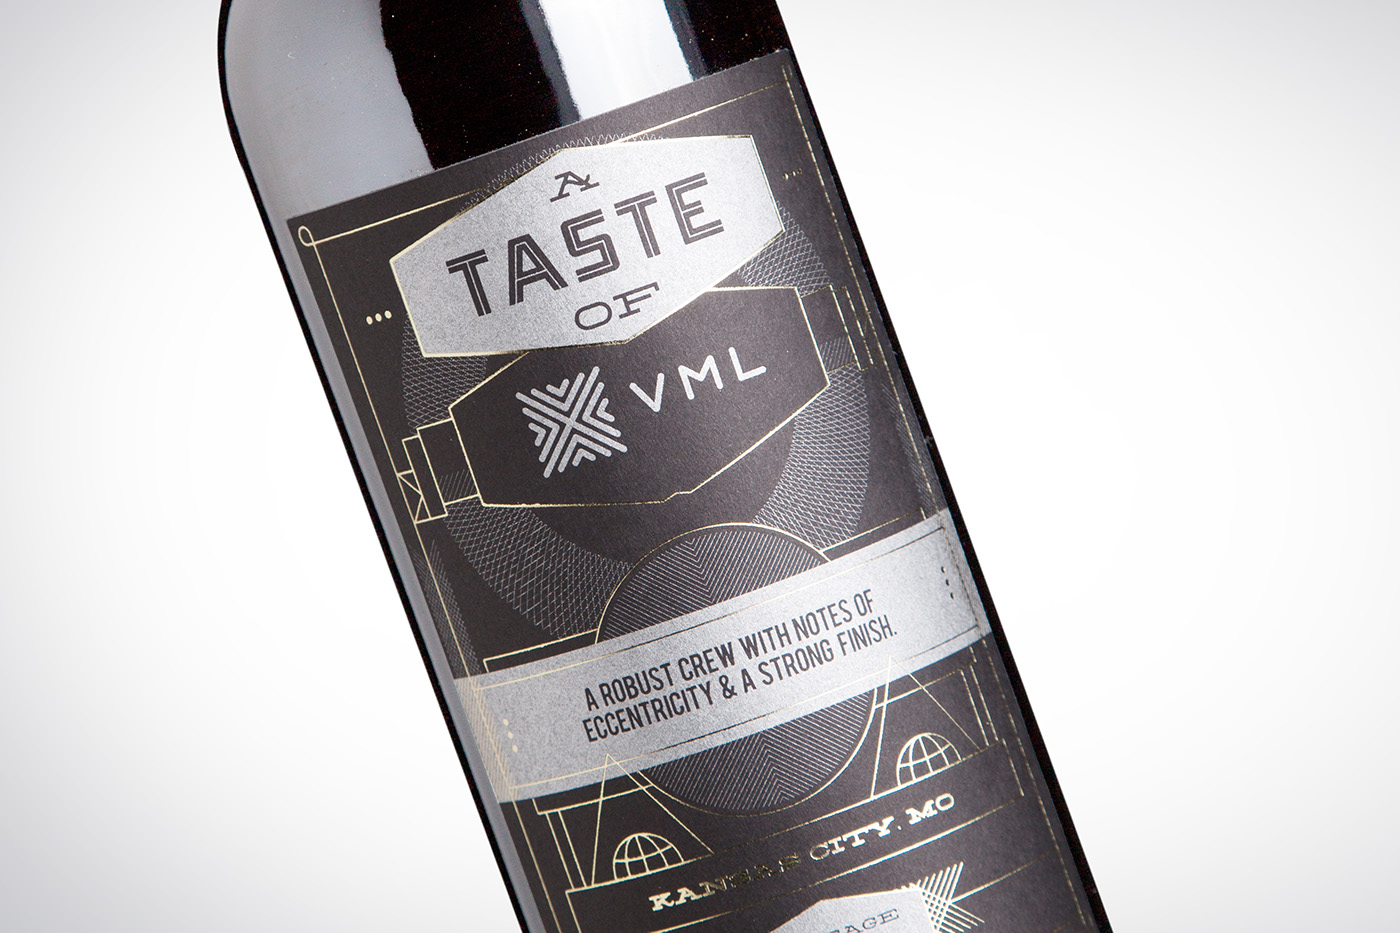 VML, Western Union,Desgin,wine,paralax,Wine Bottle,Wine Packaging,packaging design,10 year anniversary,Self Promotion,gift,Wine gift,wine label